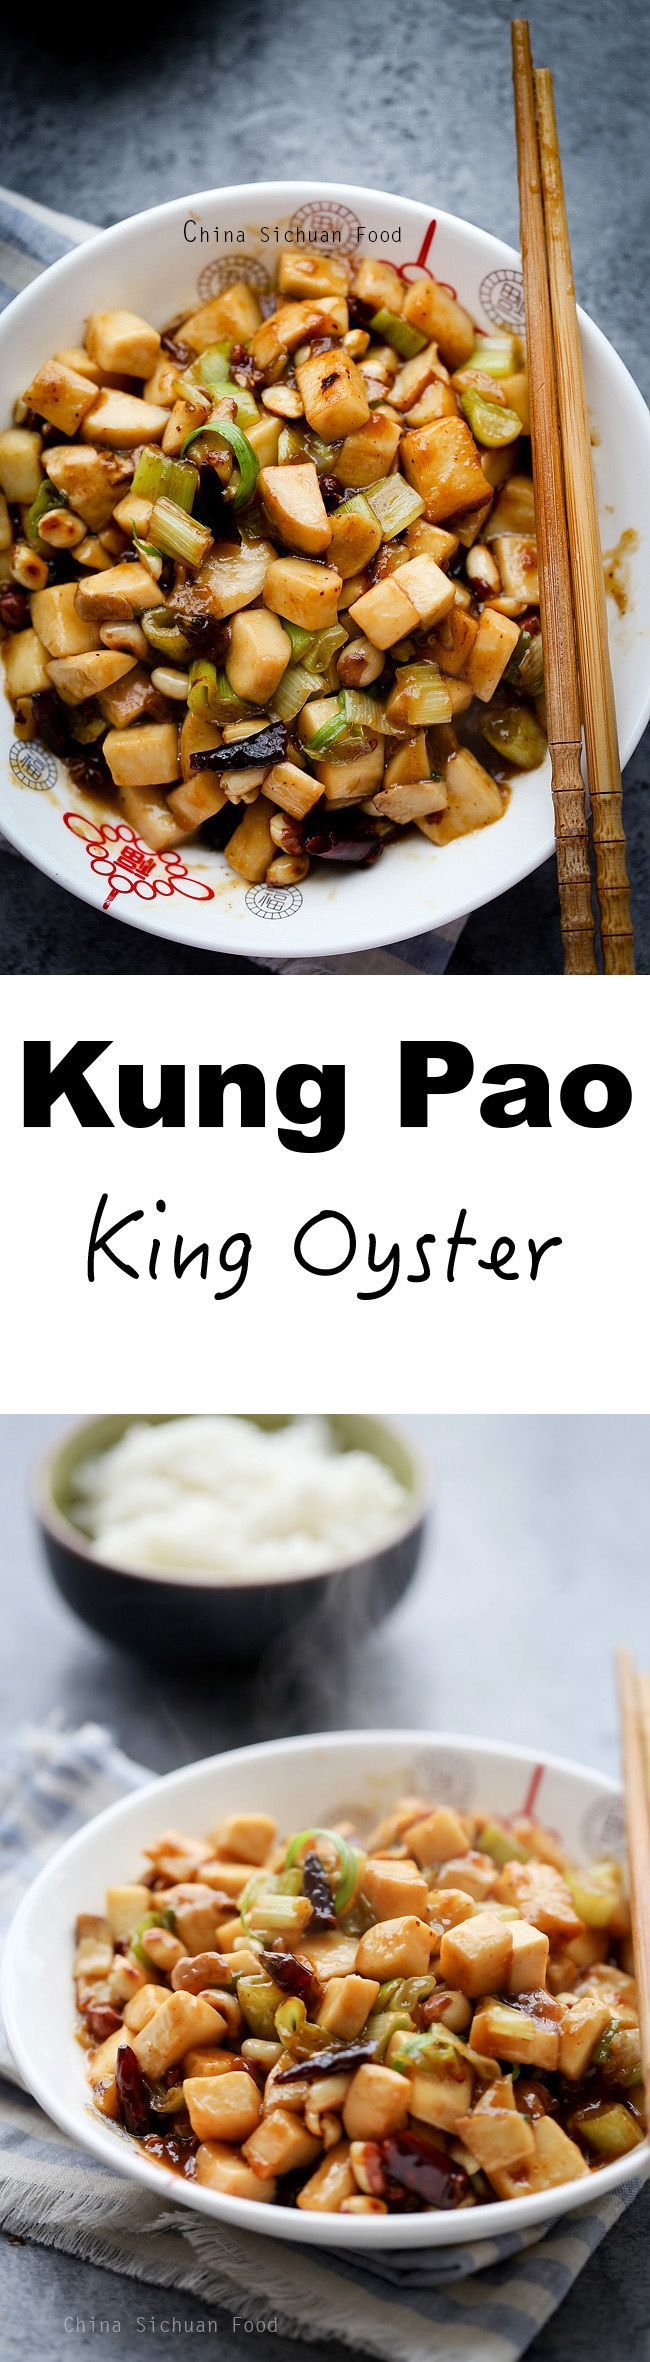 Kung Pao King Oyster mushroom